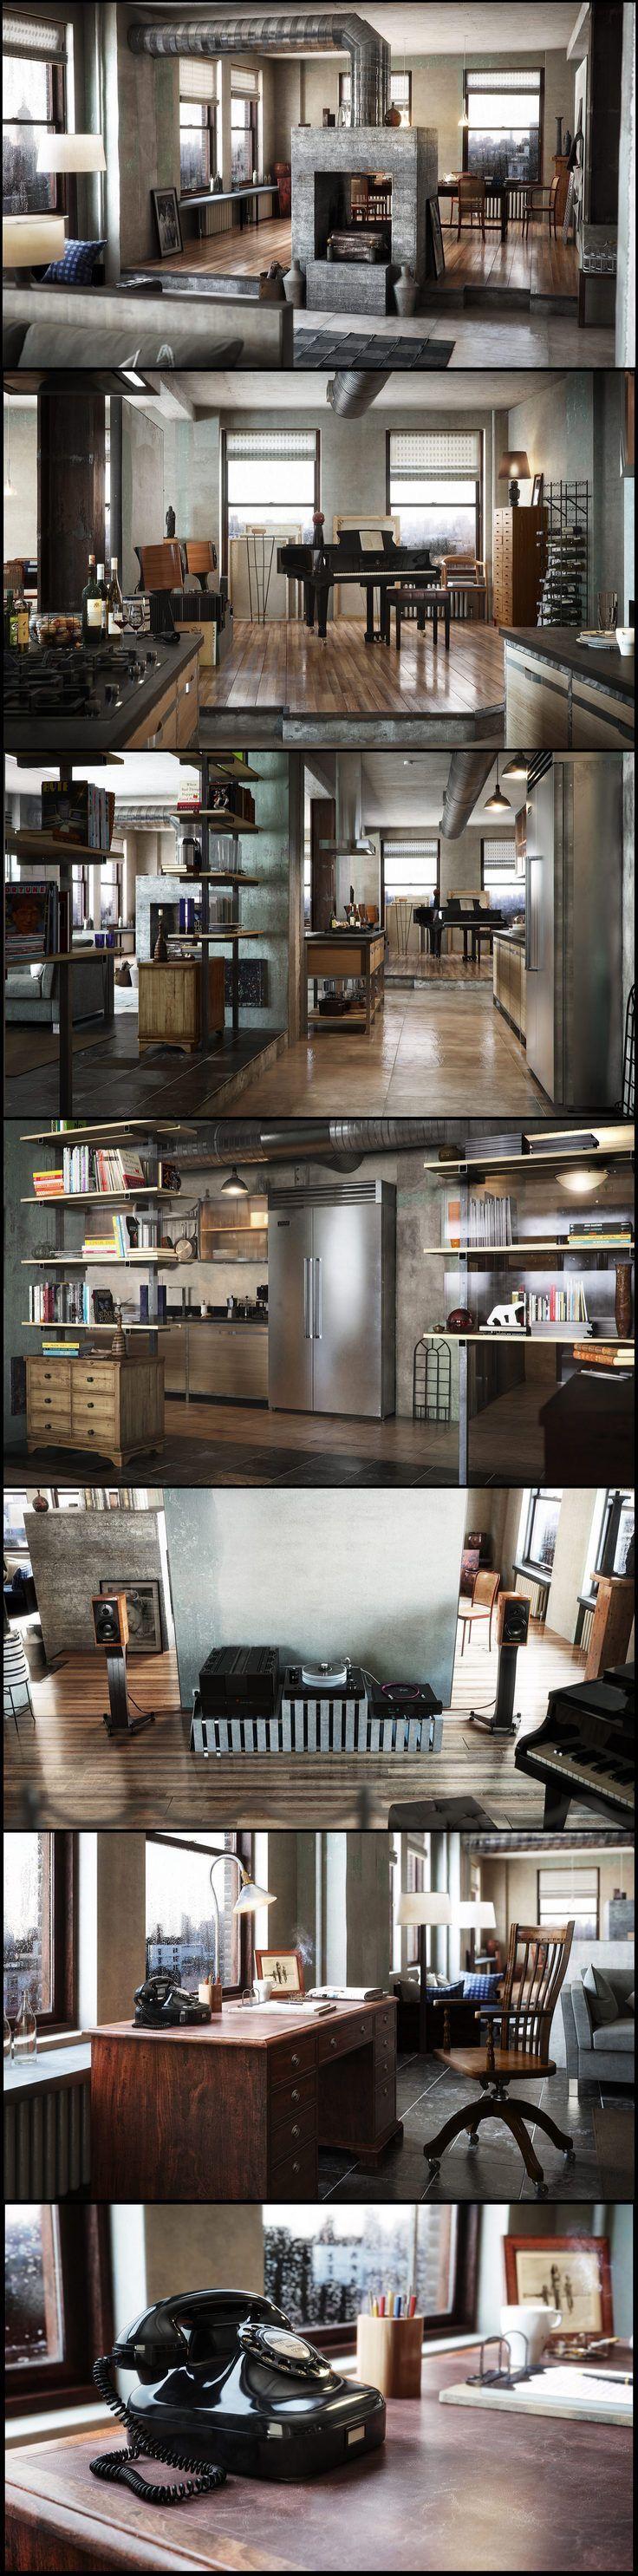 21 best Loft images on Pinterest | Industrial loft, Industrial ...